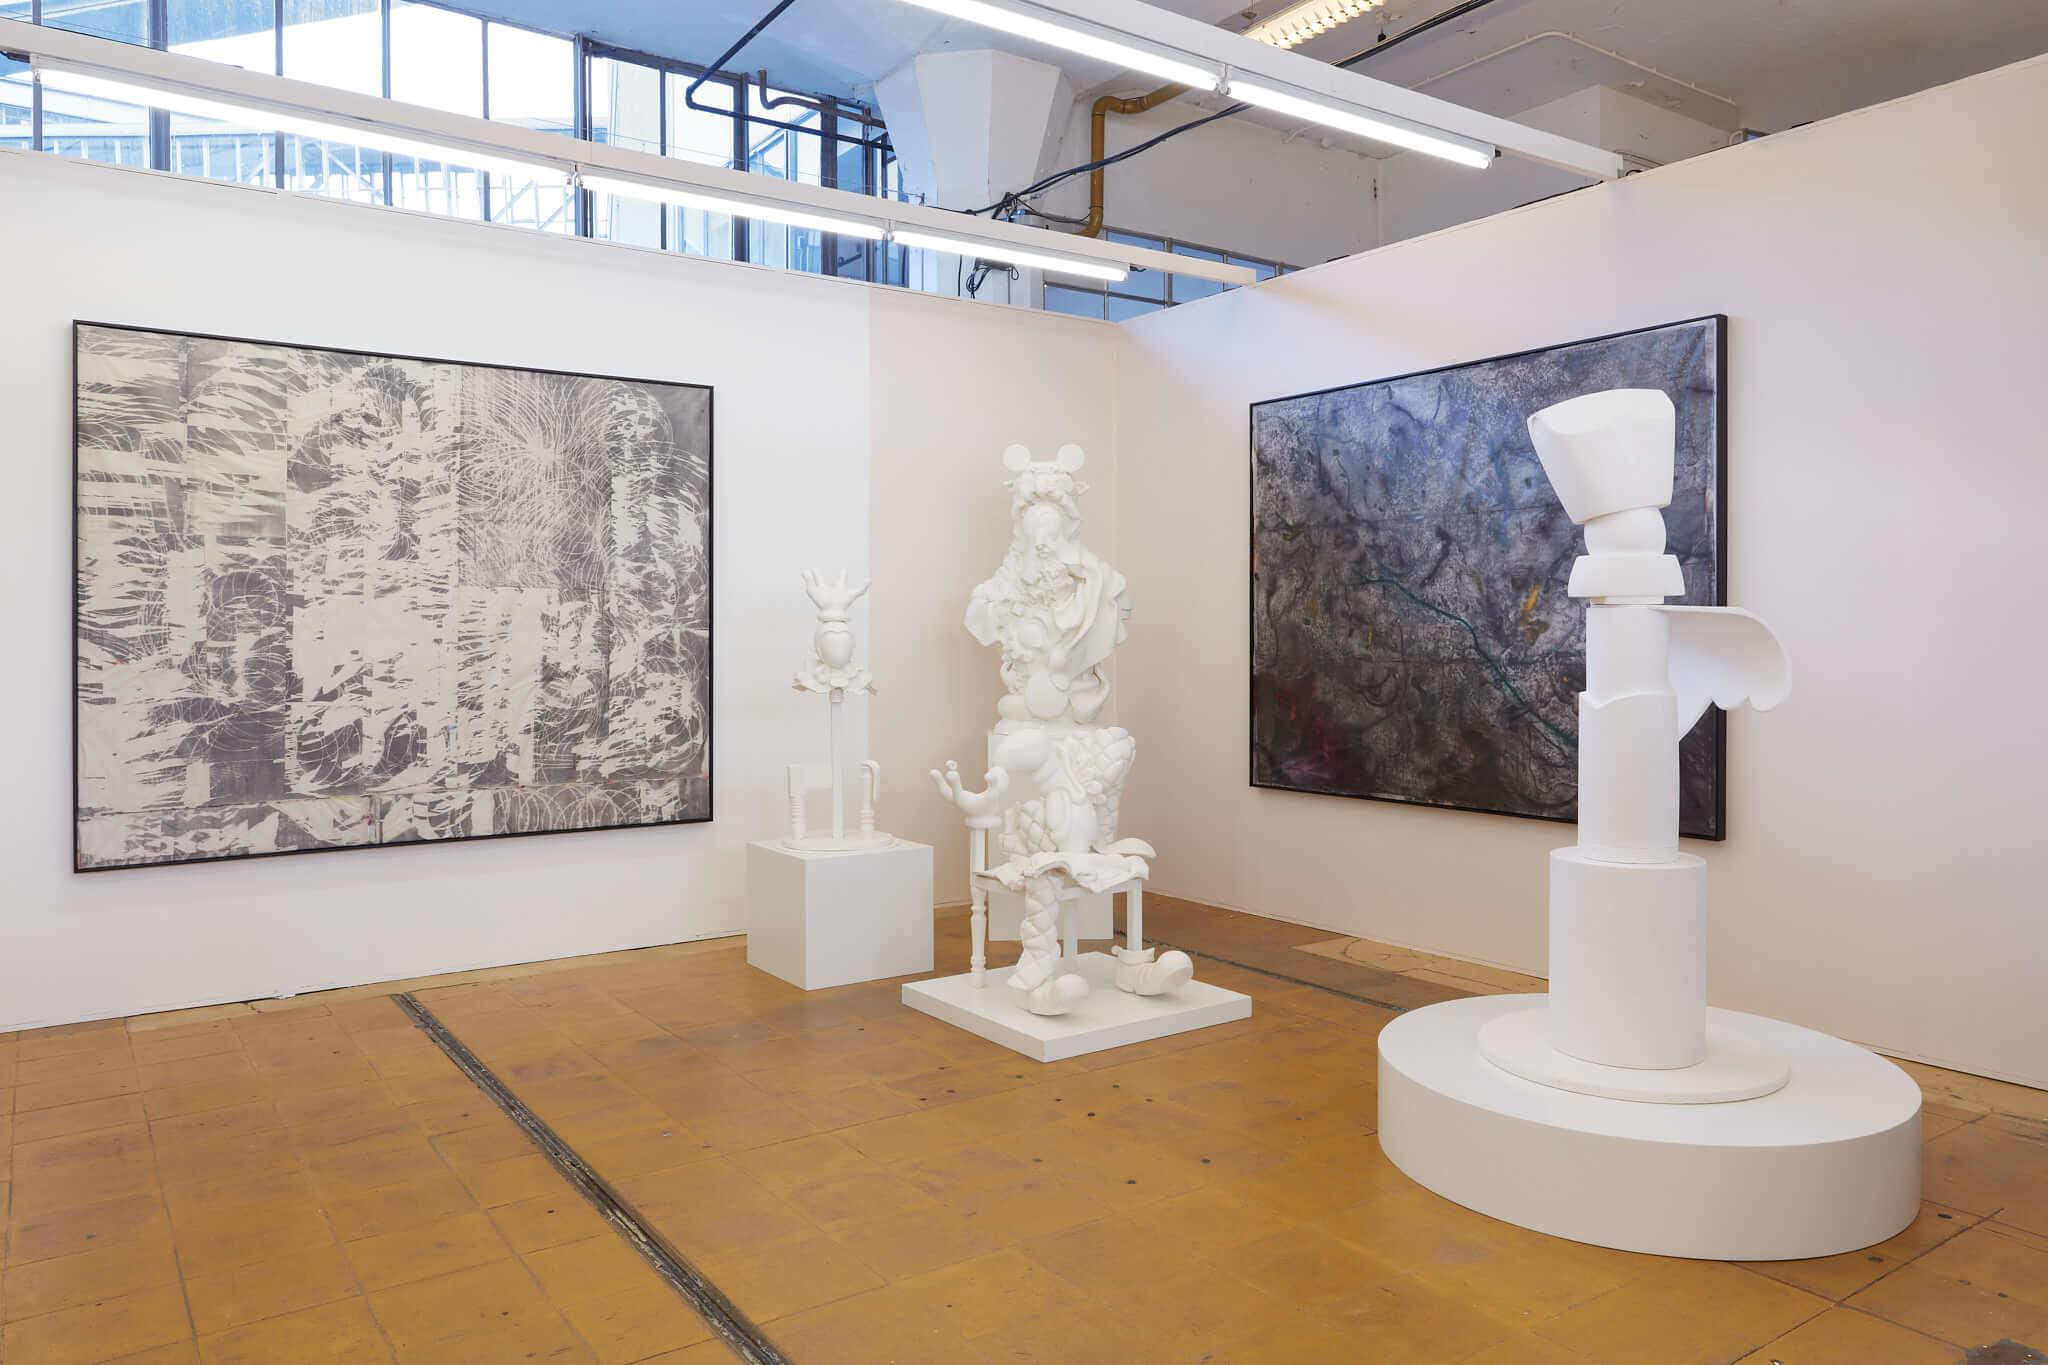 art rotterdam, dmw gallery, denitsa todorova, nadia naveau, base-alpha